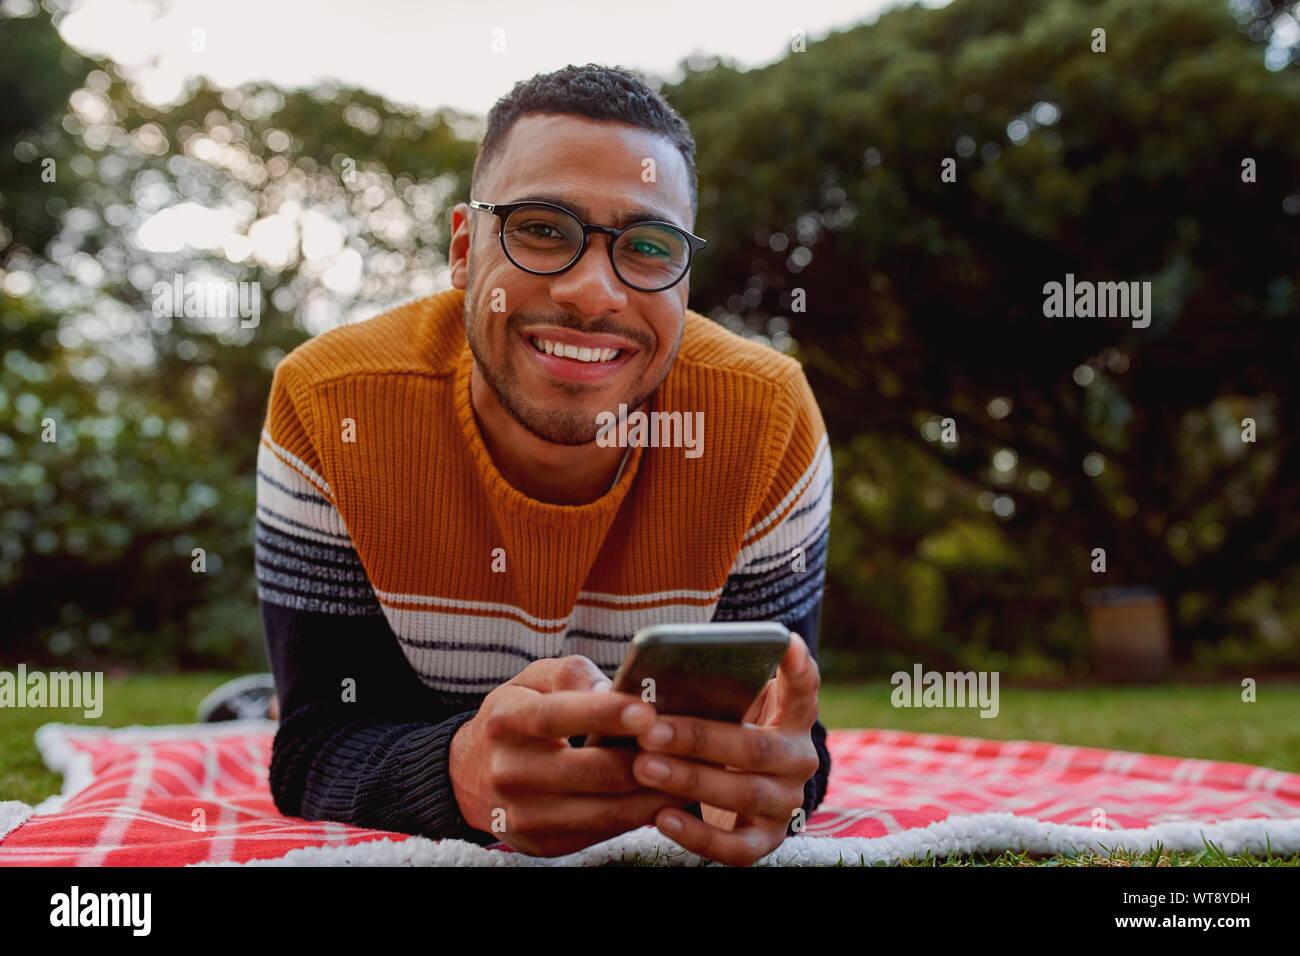 Portrait of a smiling african american man lying on blanket in the park holding mobile phone dans la main à la caméra en souriant Banque D'Images